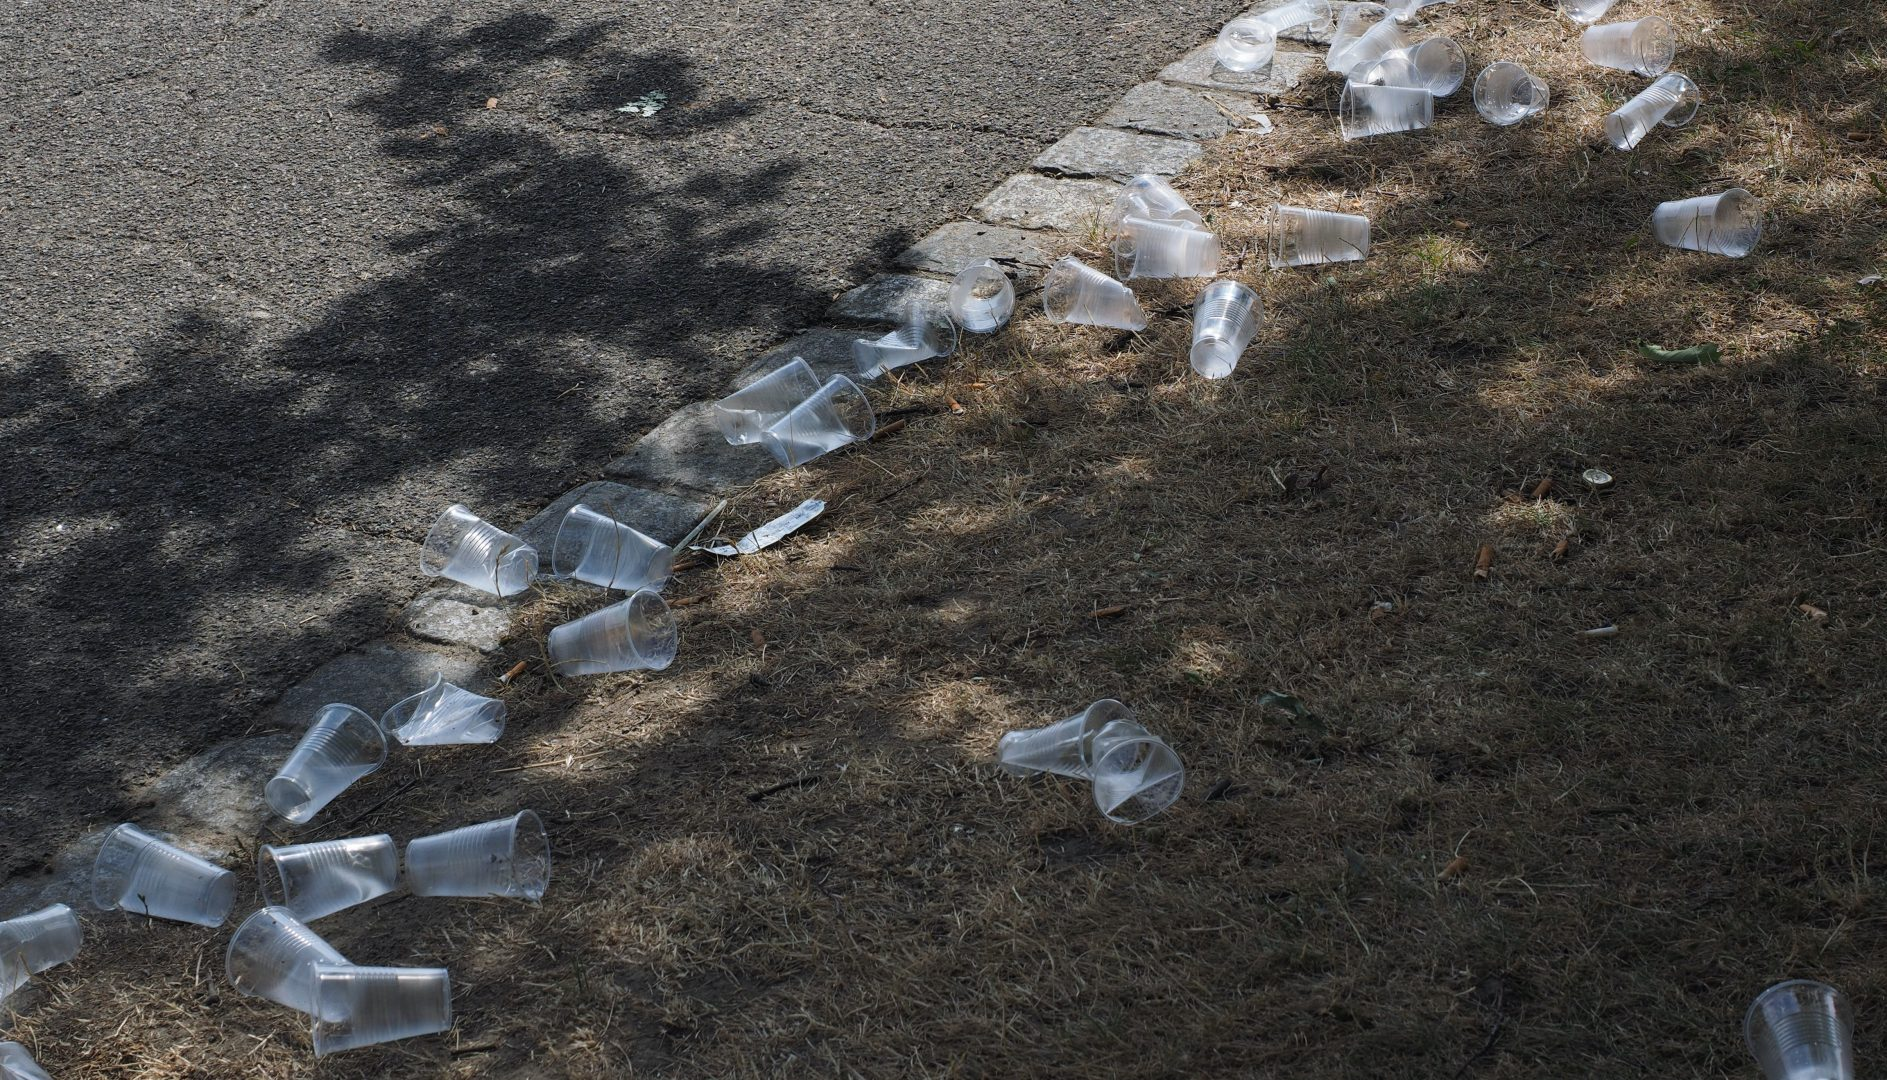 plastique gobelets jetables